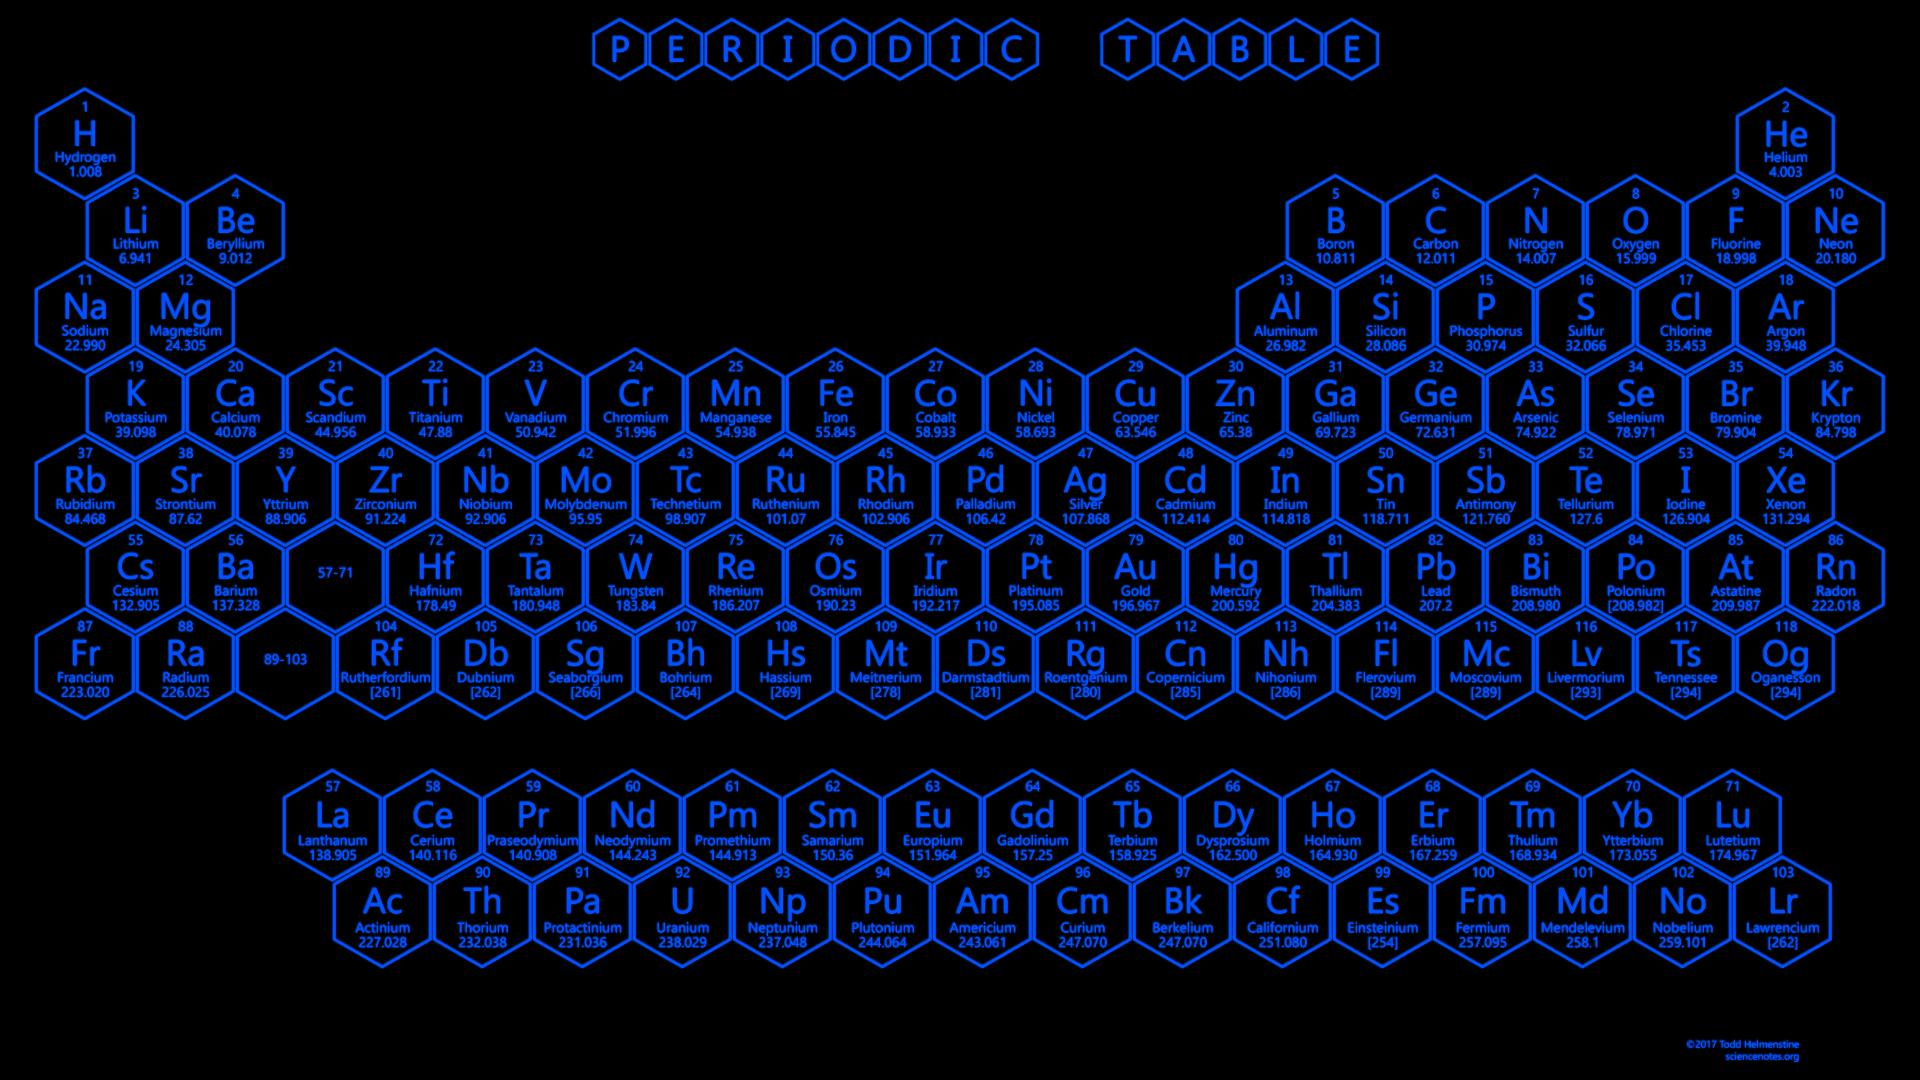 Neon hexagon periodic table wallpapers hd periodic table wallpapers blue neon hexagon periodic table urtaz Choice Image